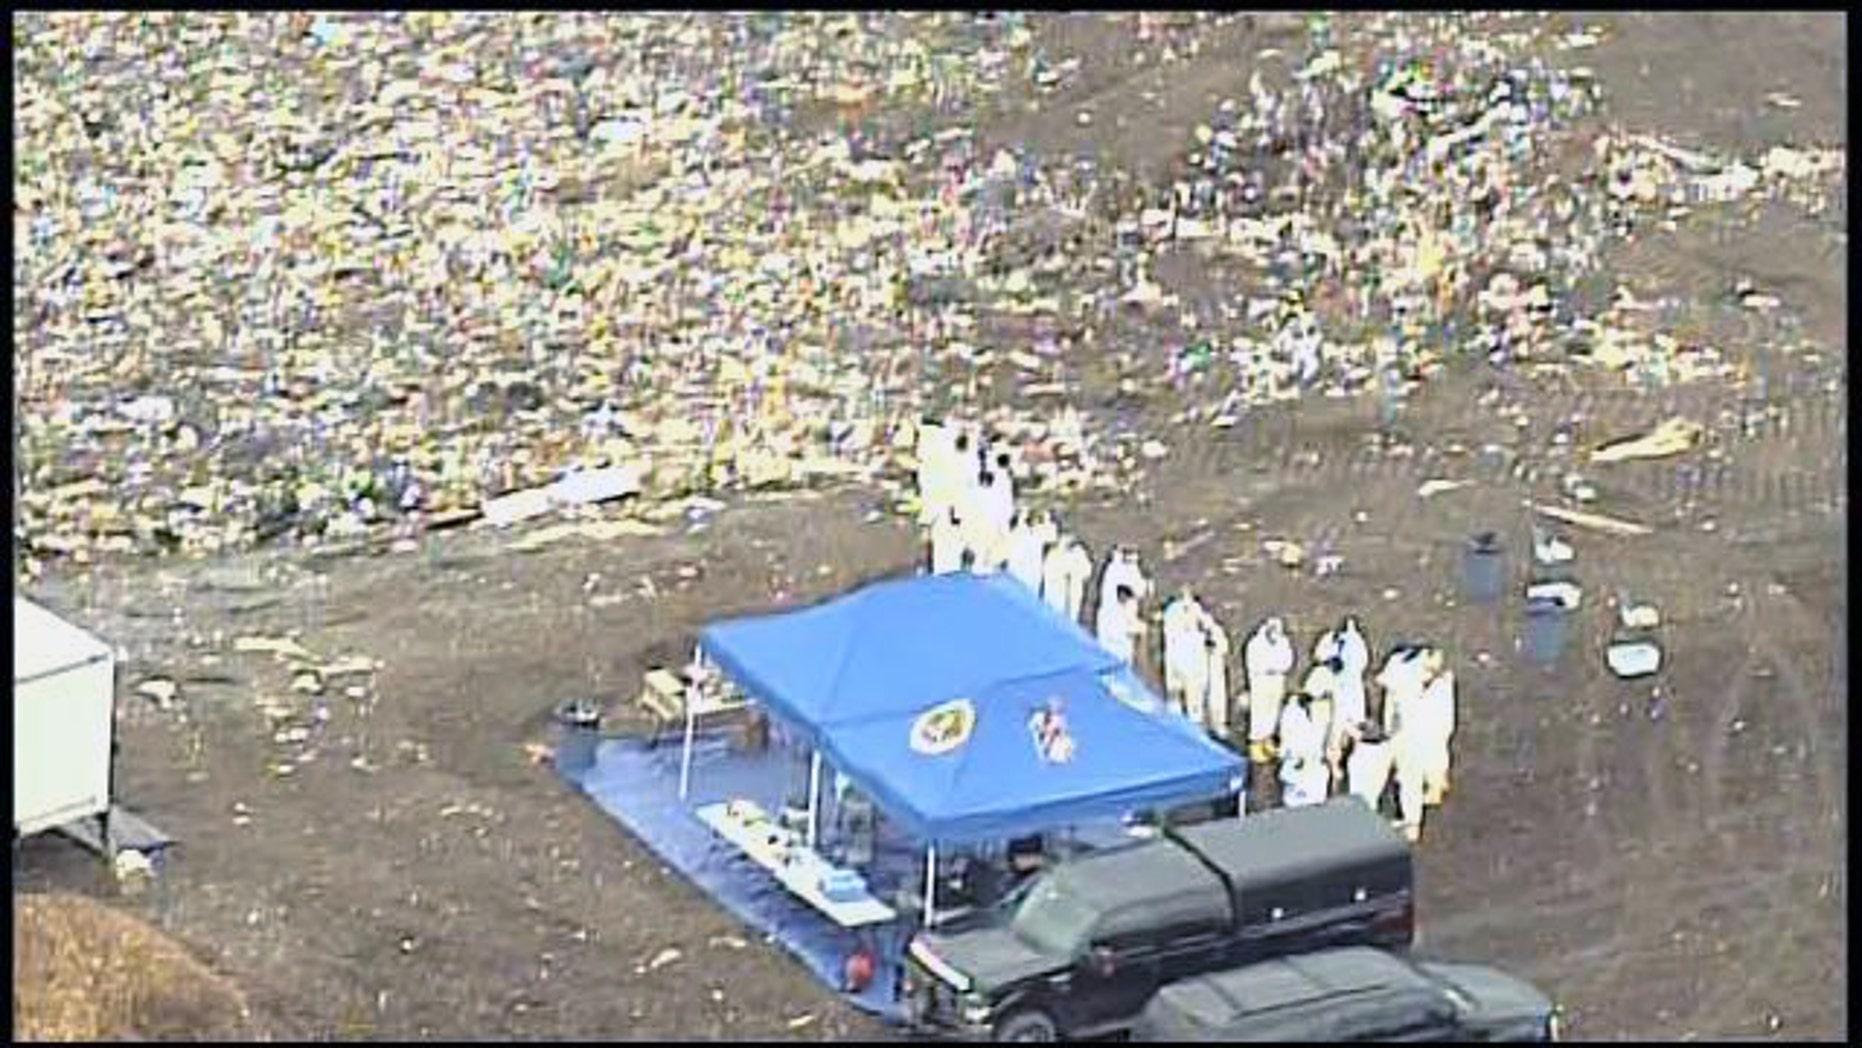 In this aerial photo FBI investigators are seen searching a landfill near the UMass-Dartmouth campus where Boston Marathon bombing suspect  Dzhokhar Tsarnaev was a student.